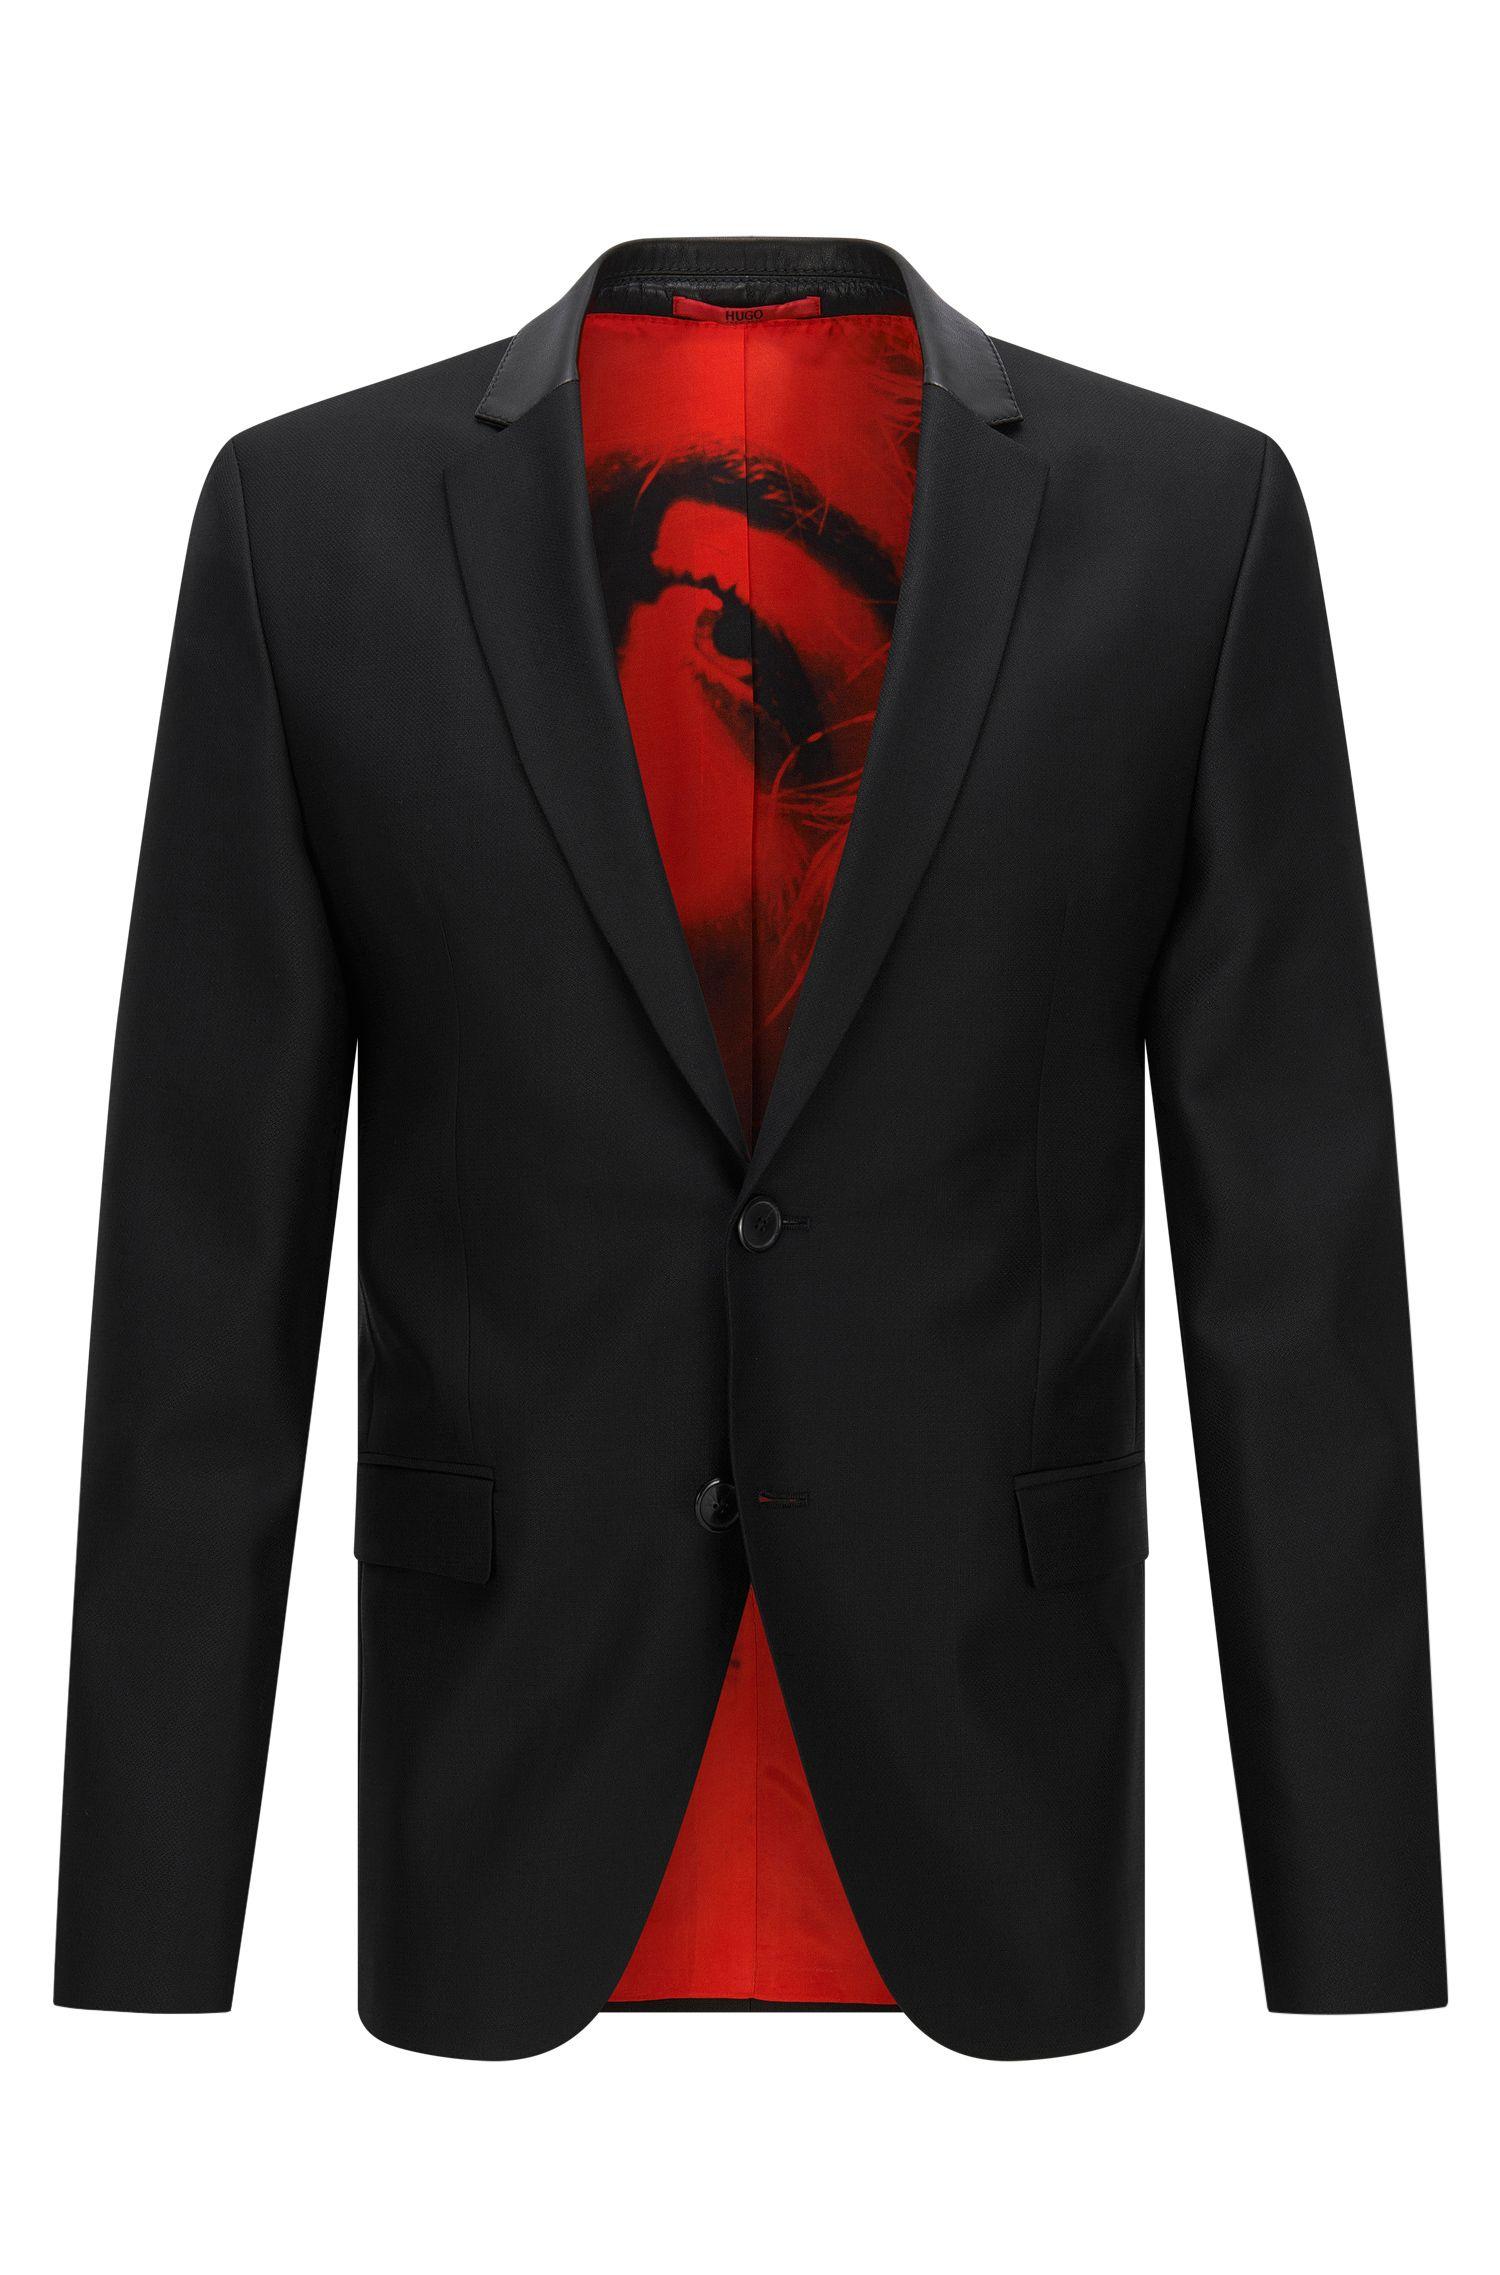 Vegan Leather Trim Virgin Wool Blend Sport Coat, Slim Fit | Awerd